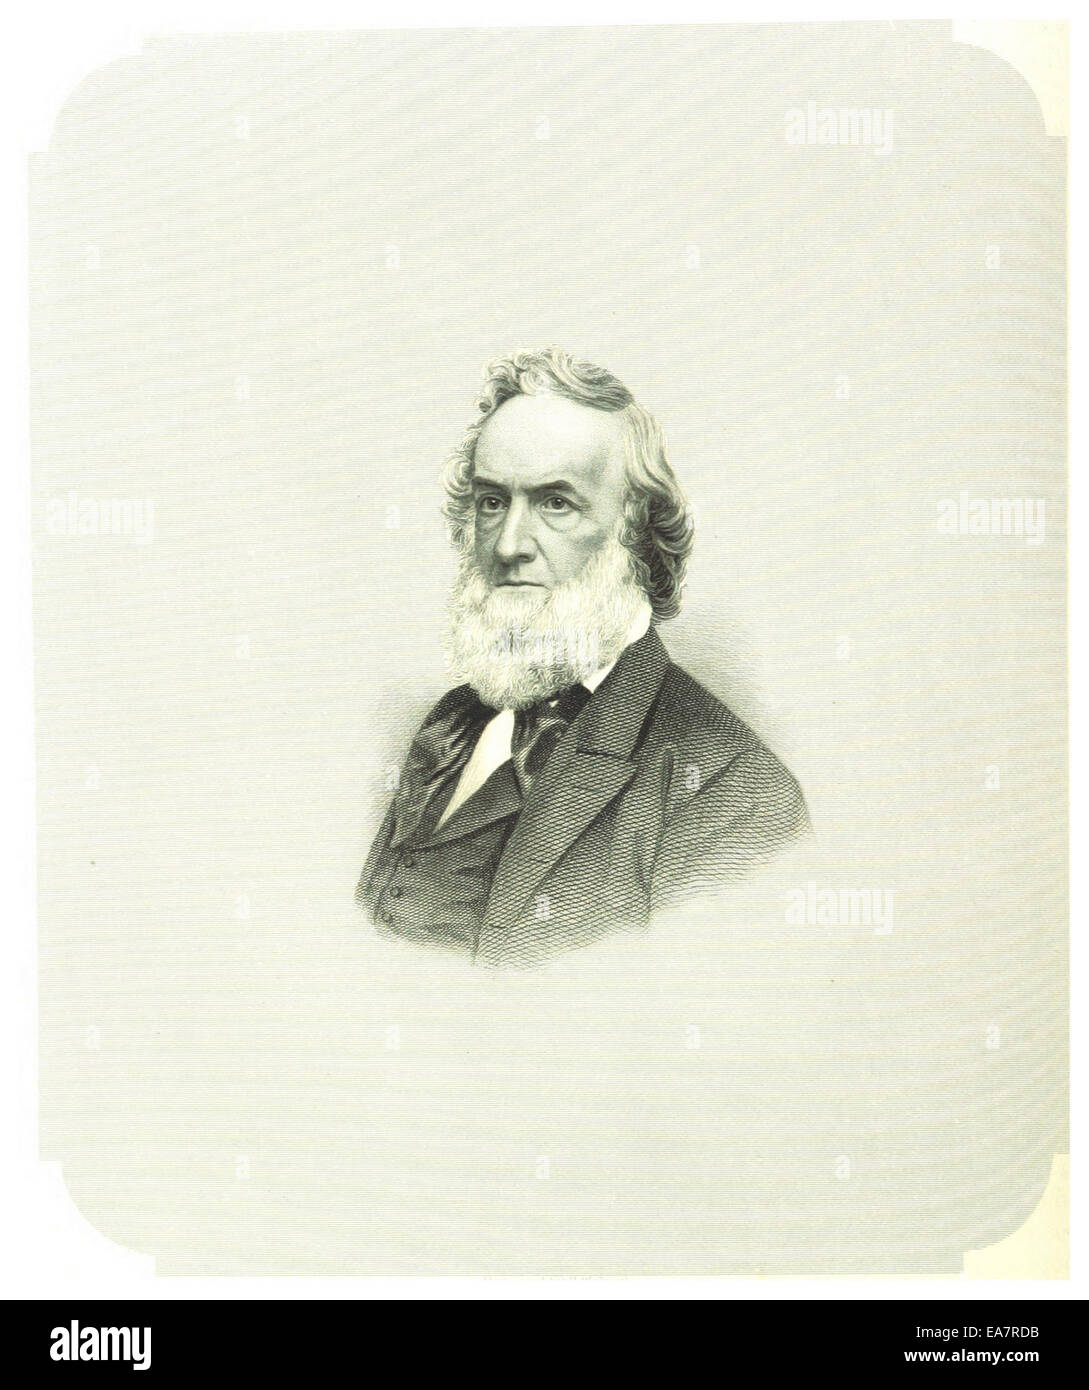 CRAFTS (1868) p1.442 GIDEON WELLES - Stock Image